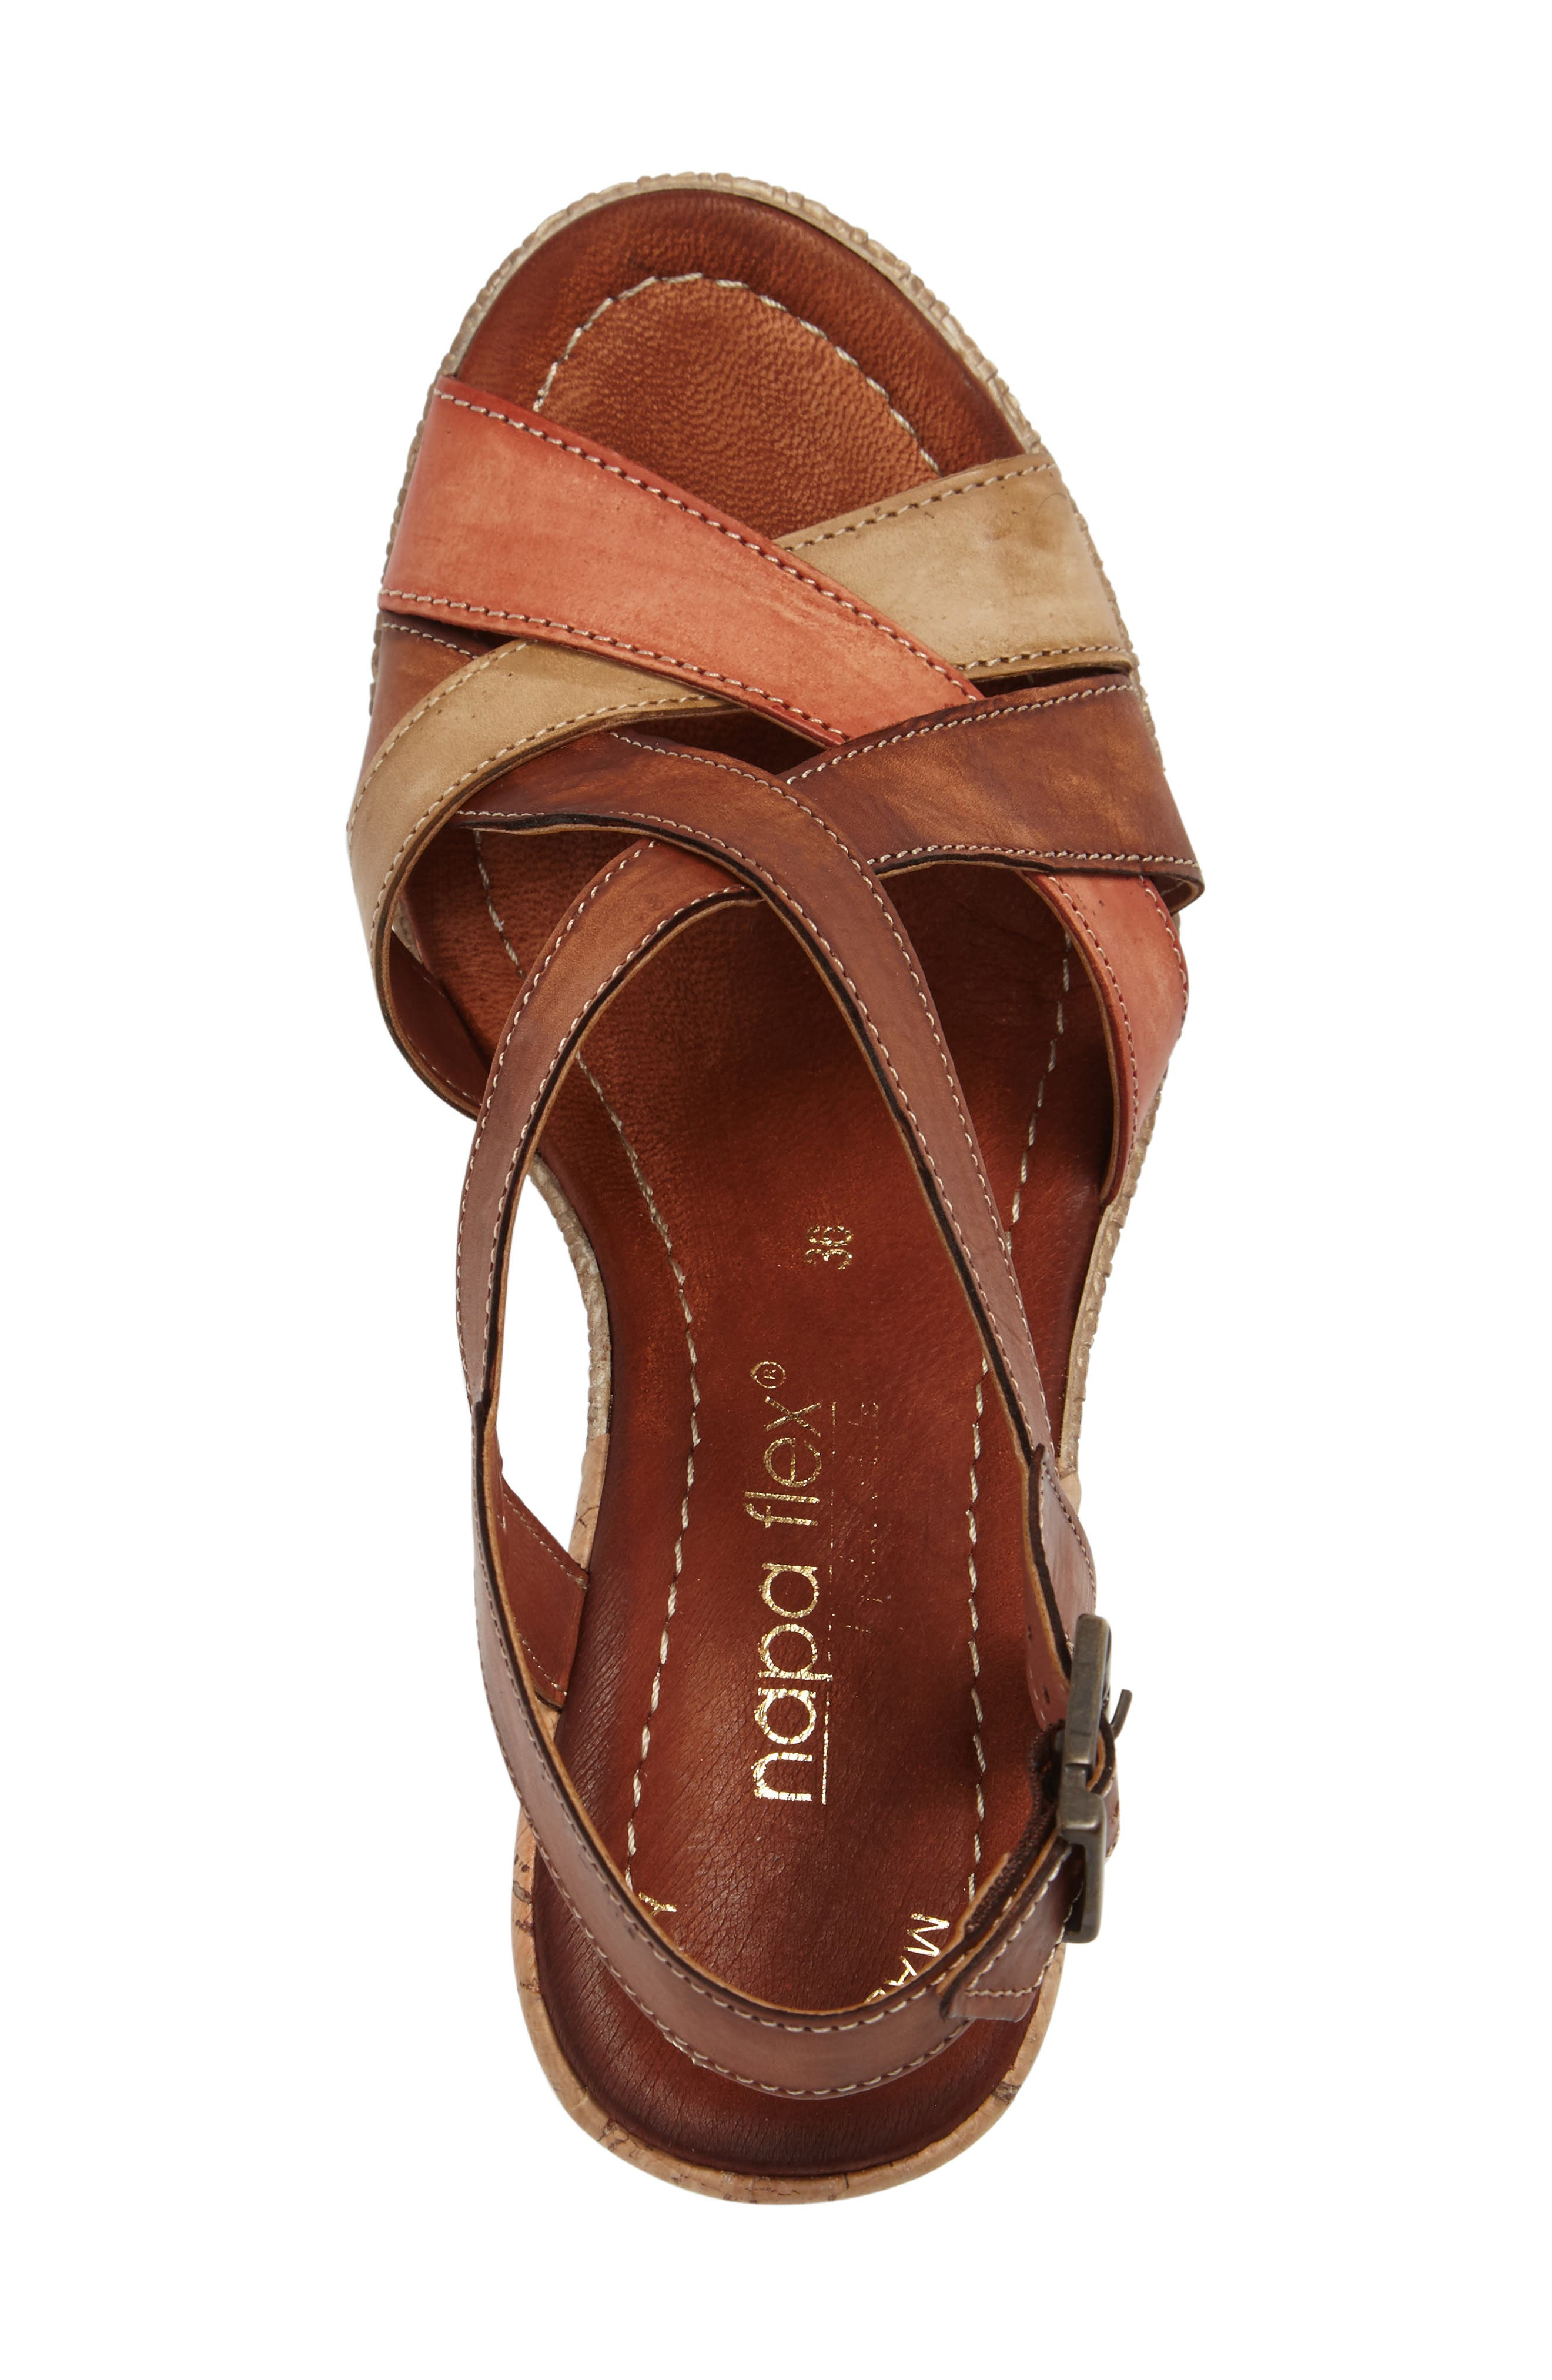 Modena Wedge Sandal,                             Alternate thumbnail 3, color,                             Cognac Leather